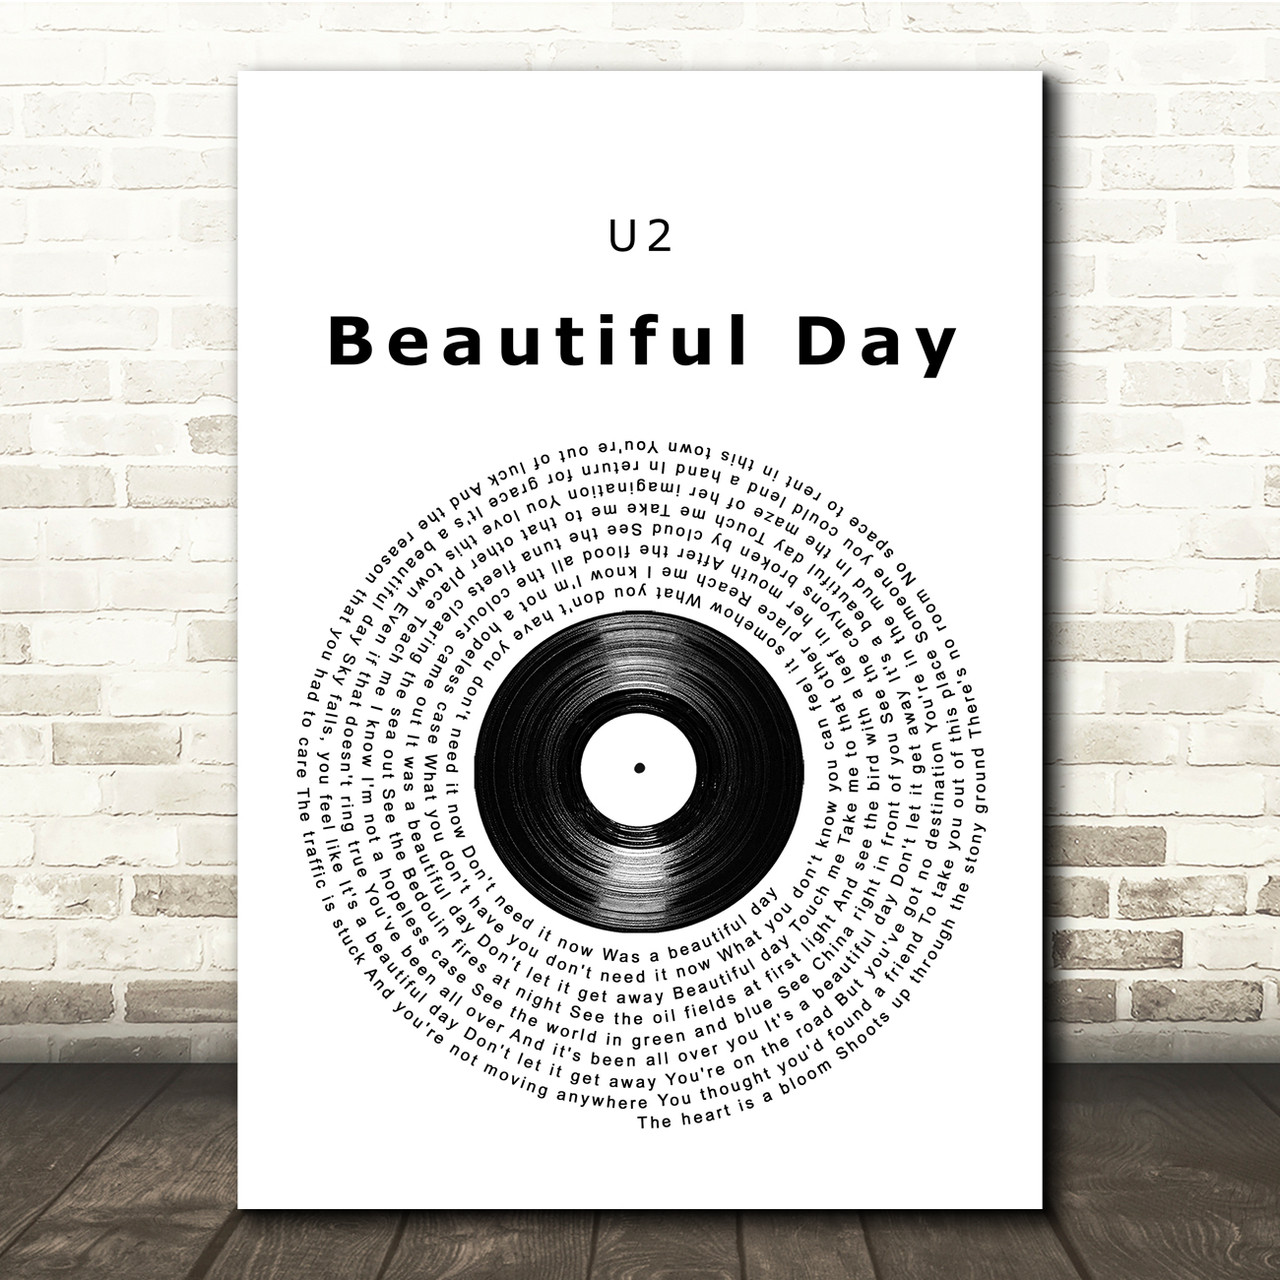 U2 Beautiful Day Vinyl Record Song Lyric Quote Print